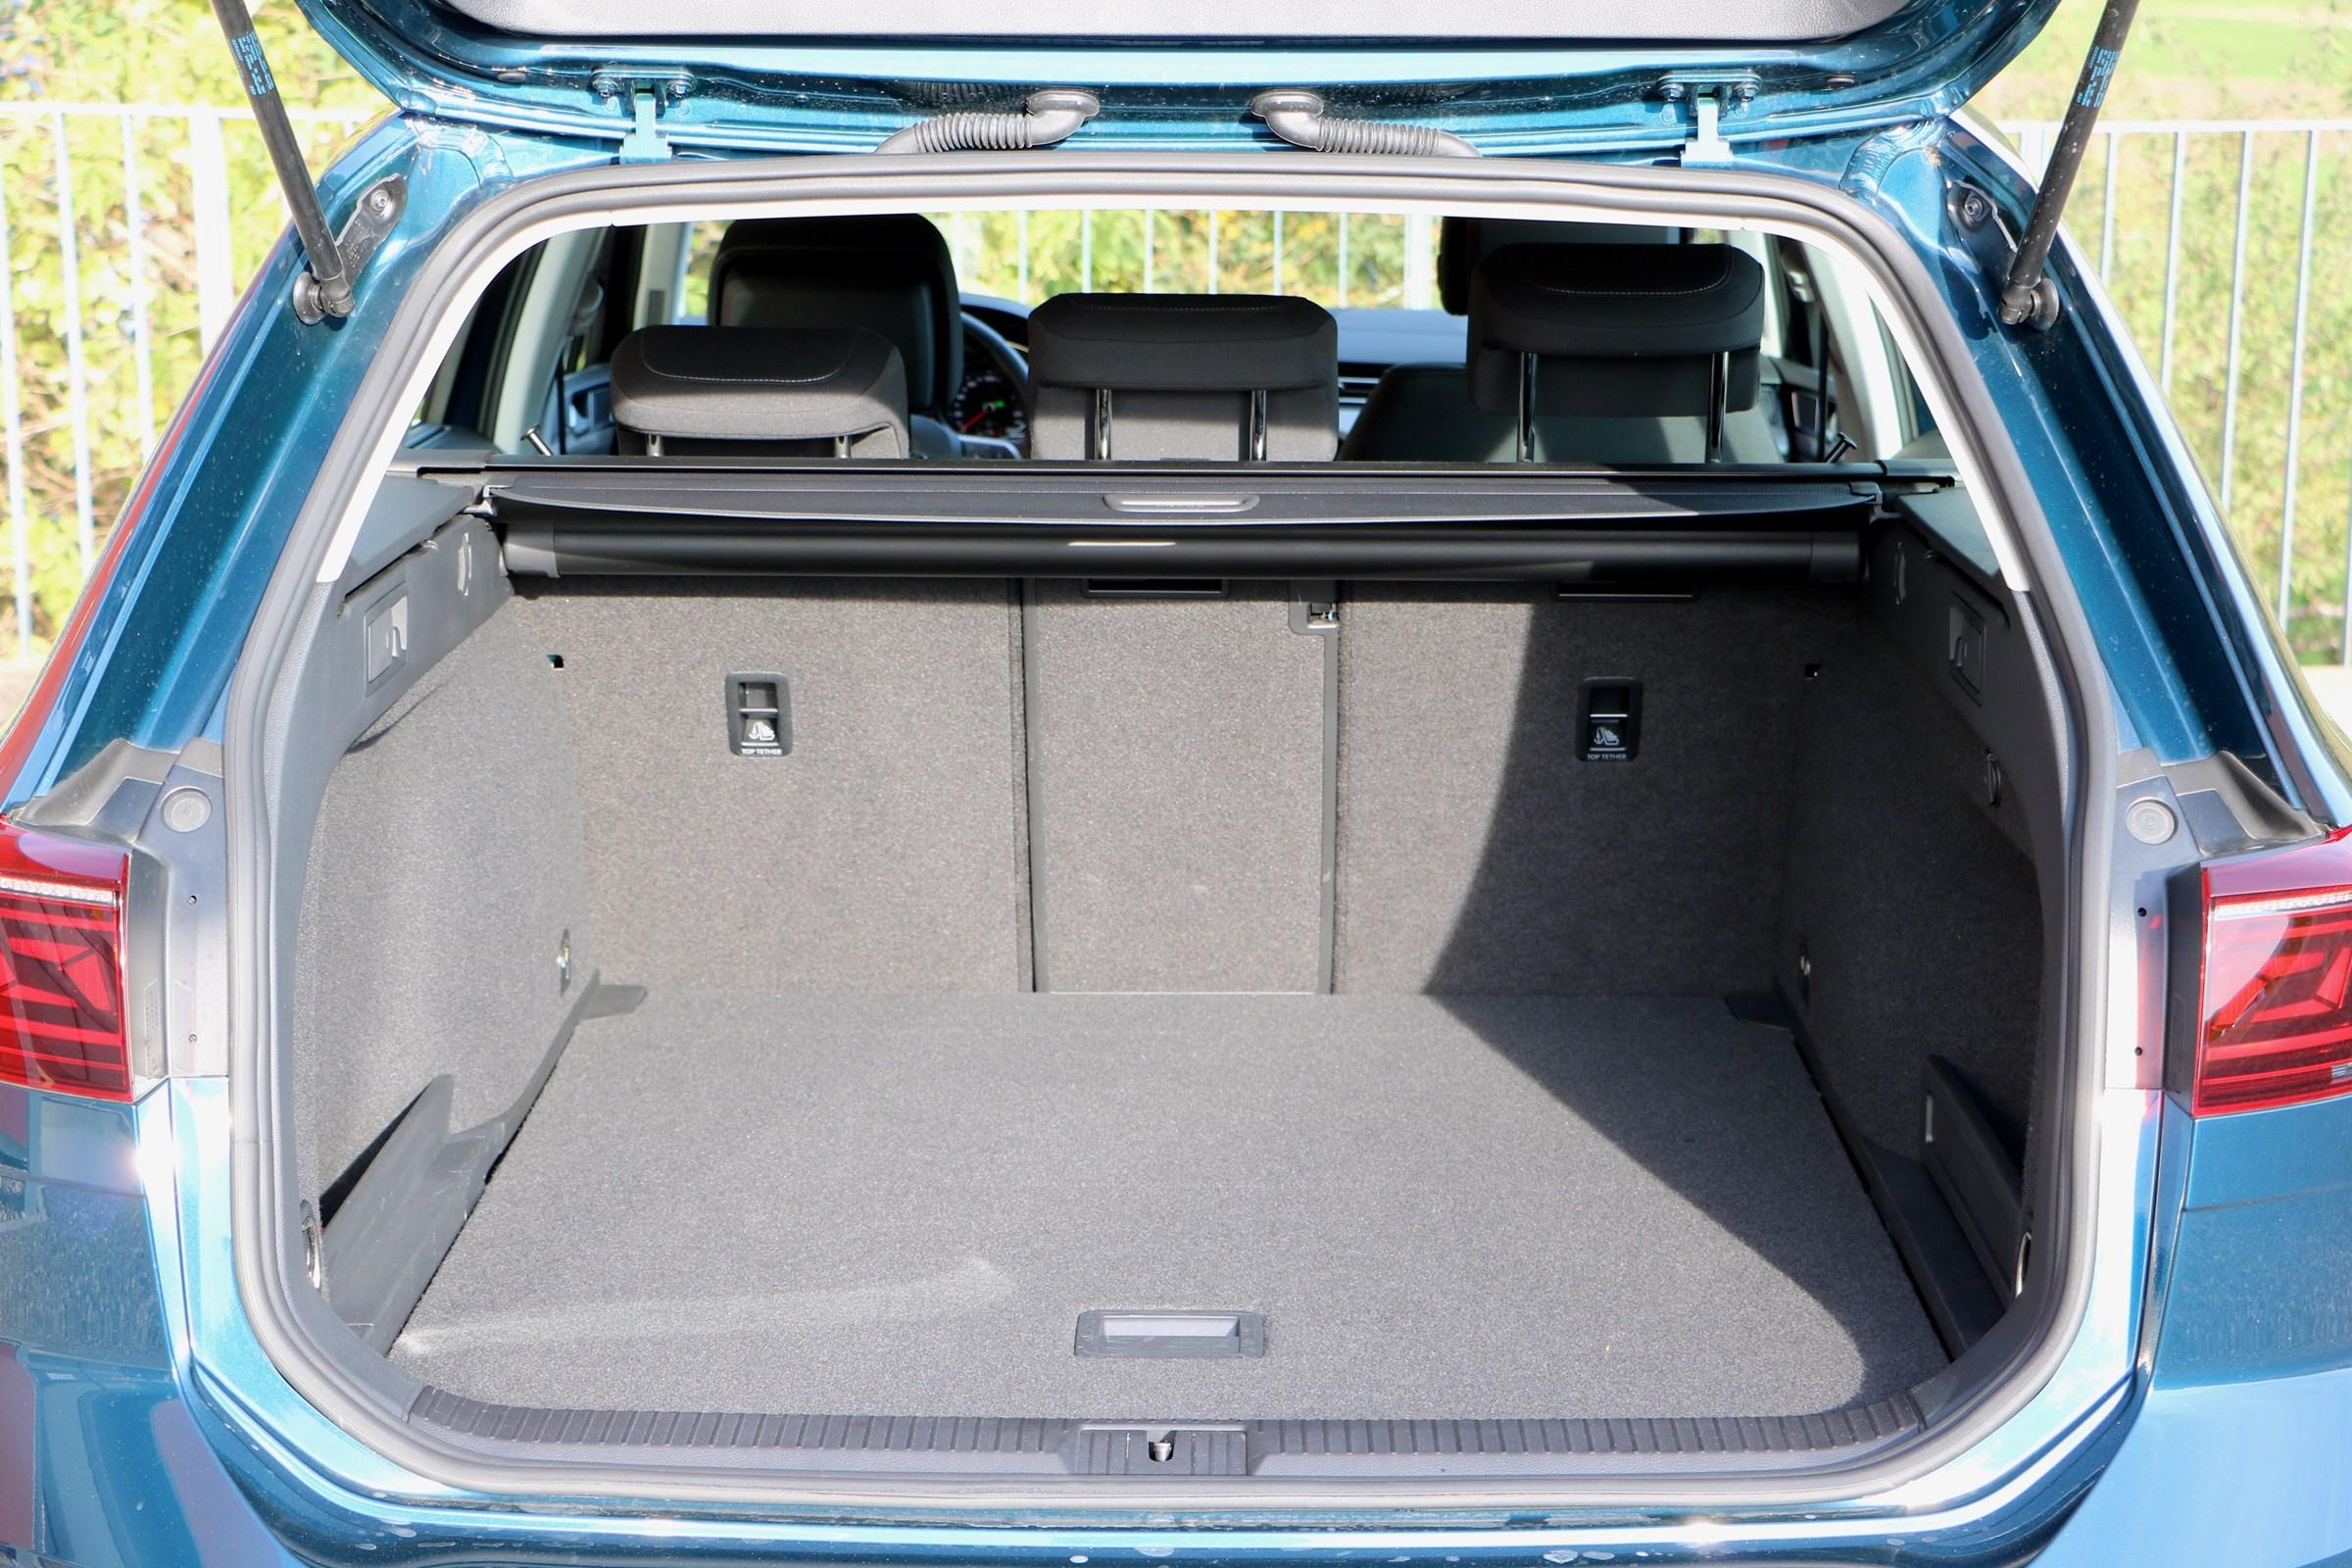 VW Passat Variant 2.0 TSI voll